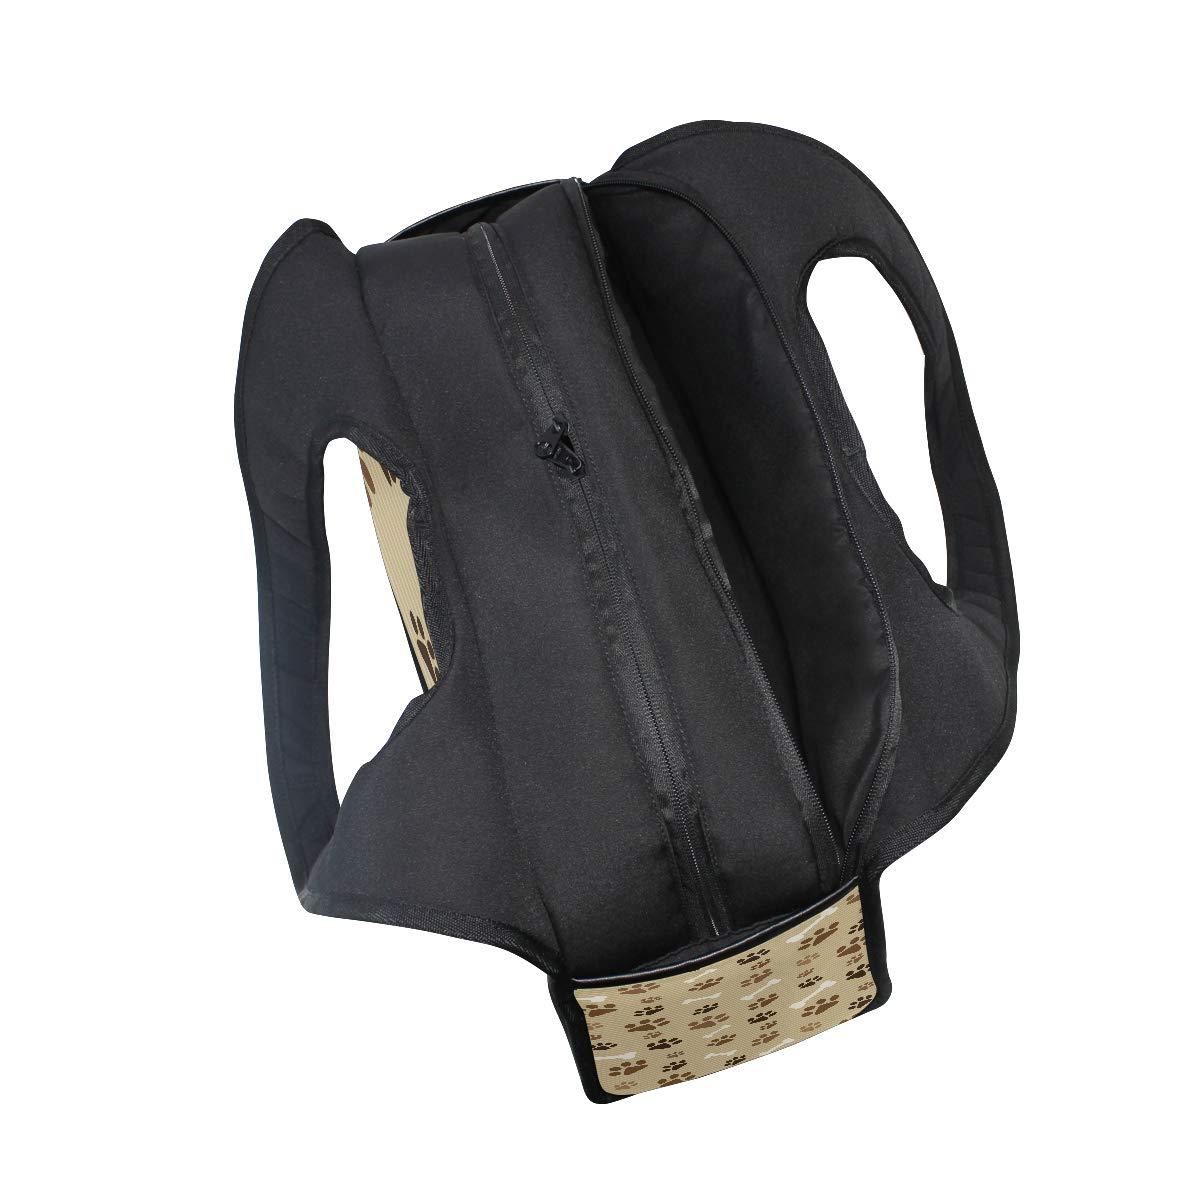 Animals Dog Cat Paw Prints Women Sports Gym Totes Bag Multi-Function Nylon Travel Shoulder Bag